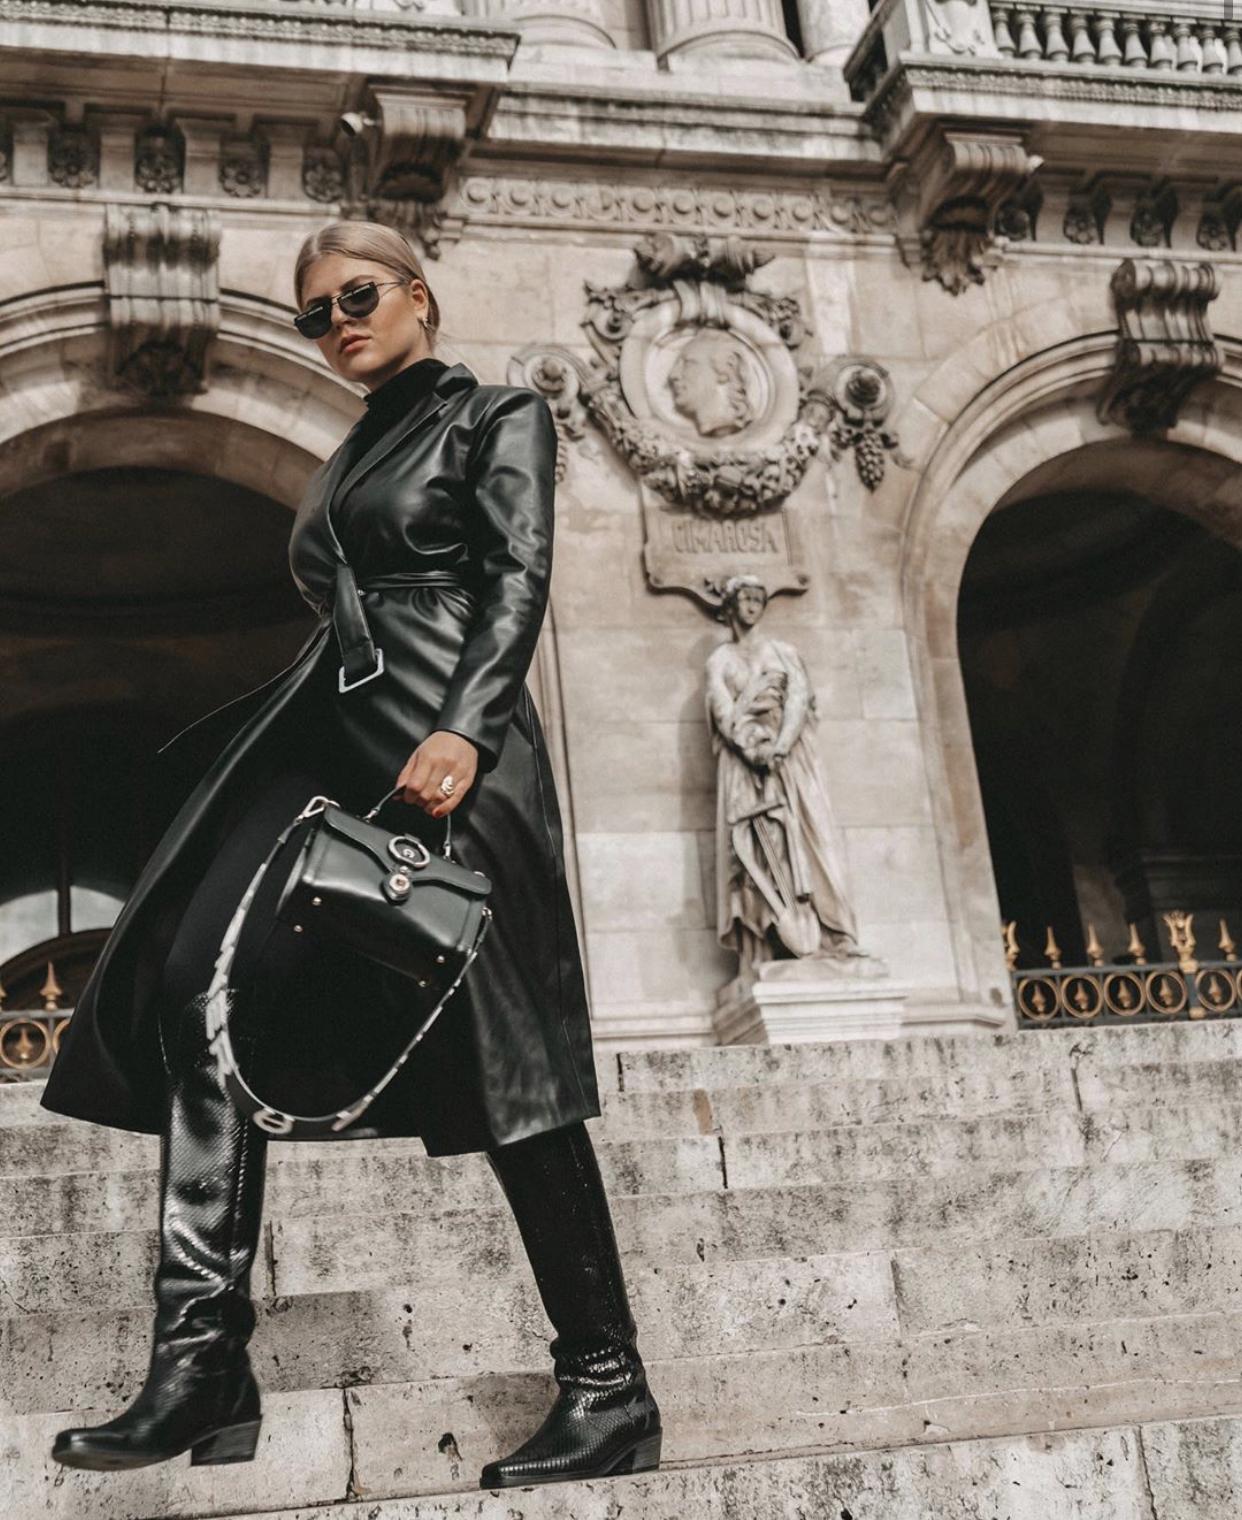 Paris Instagram Spot Palais Garnier, 12